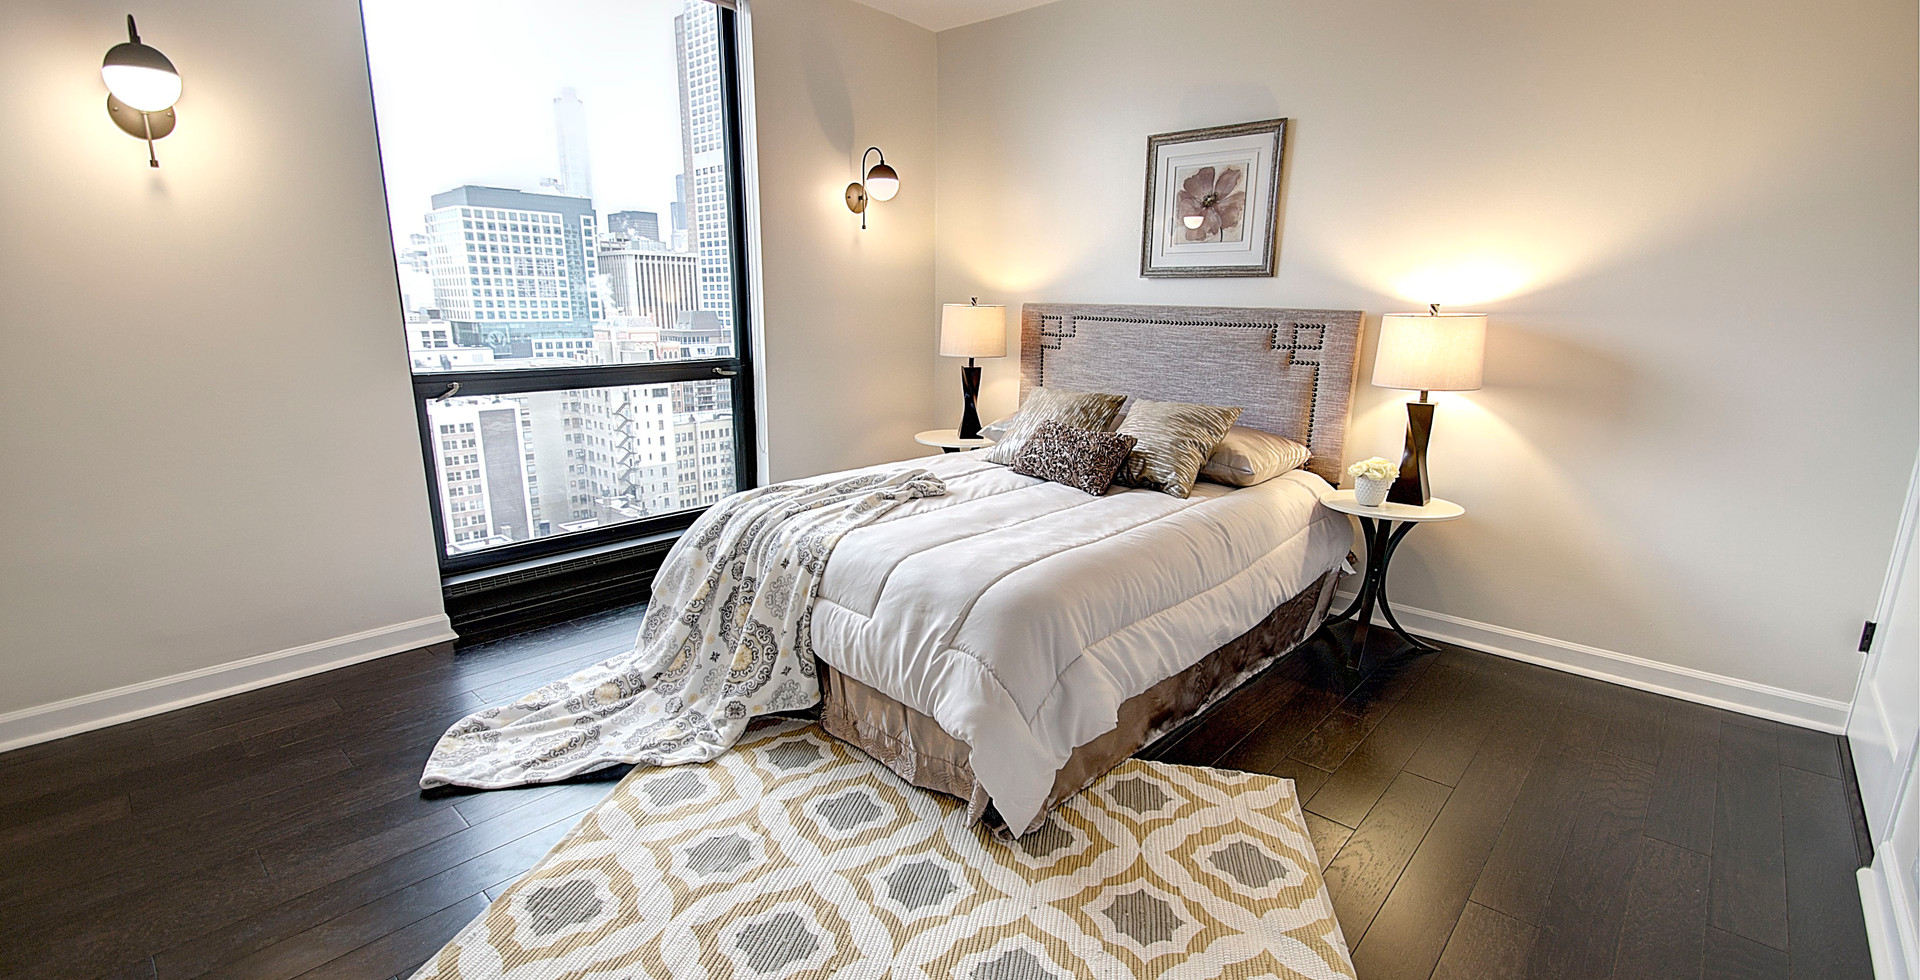 Bedroom in Aurora designed by MRM Home Design.jpg